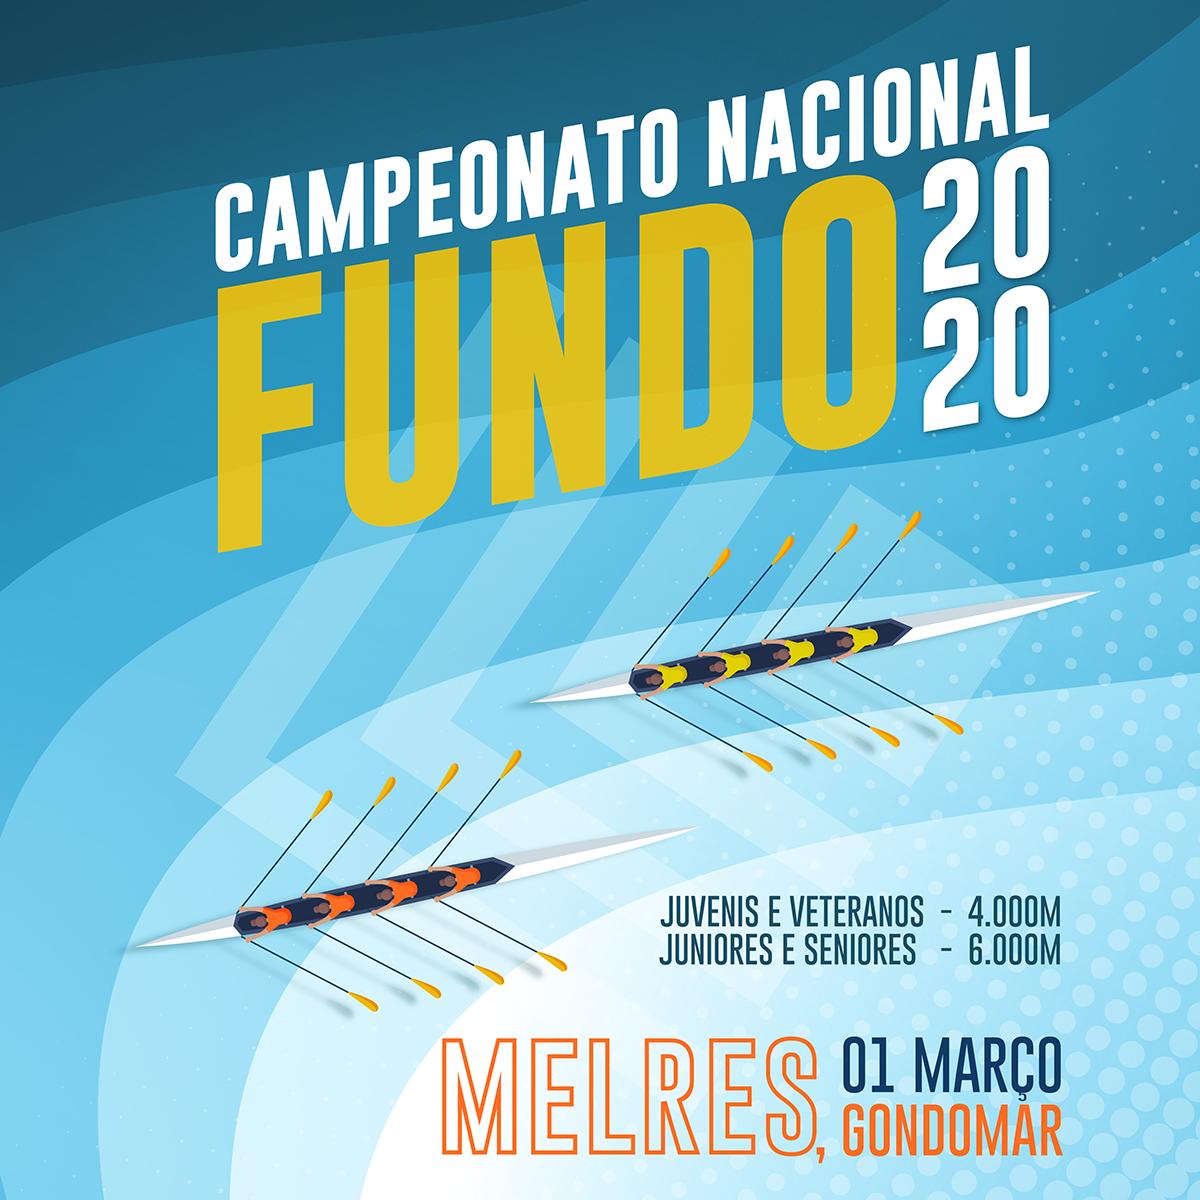 Campeonato Nacional de Fundo 2020